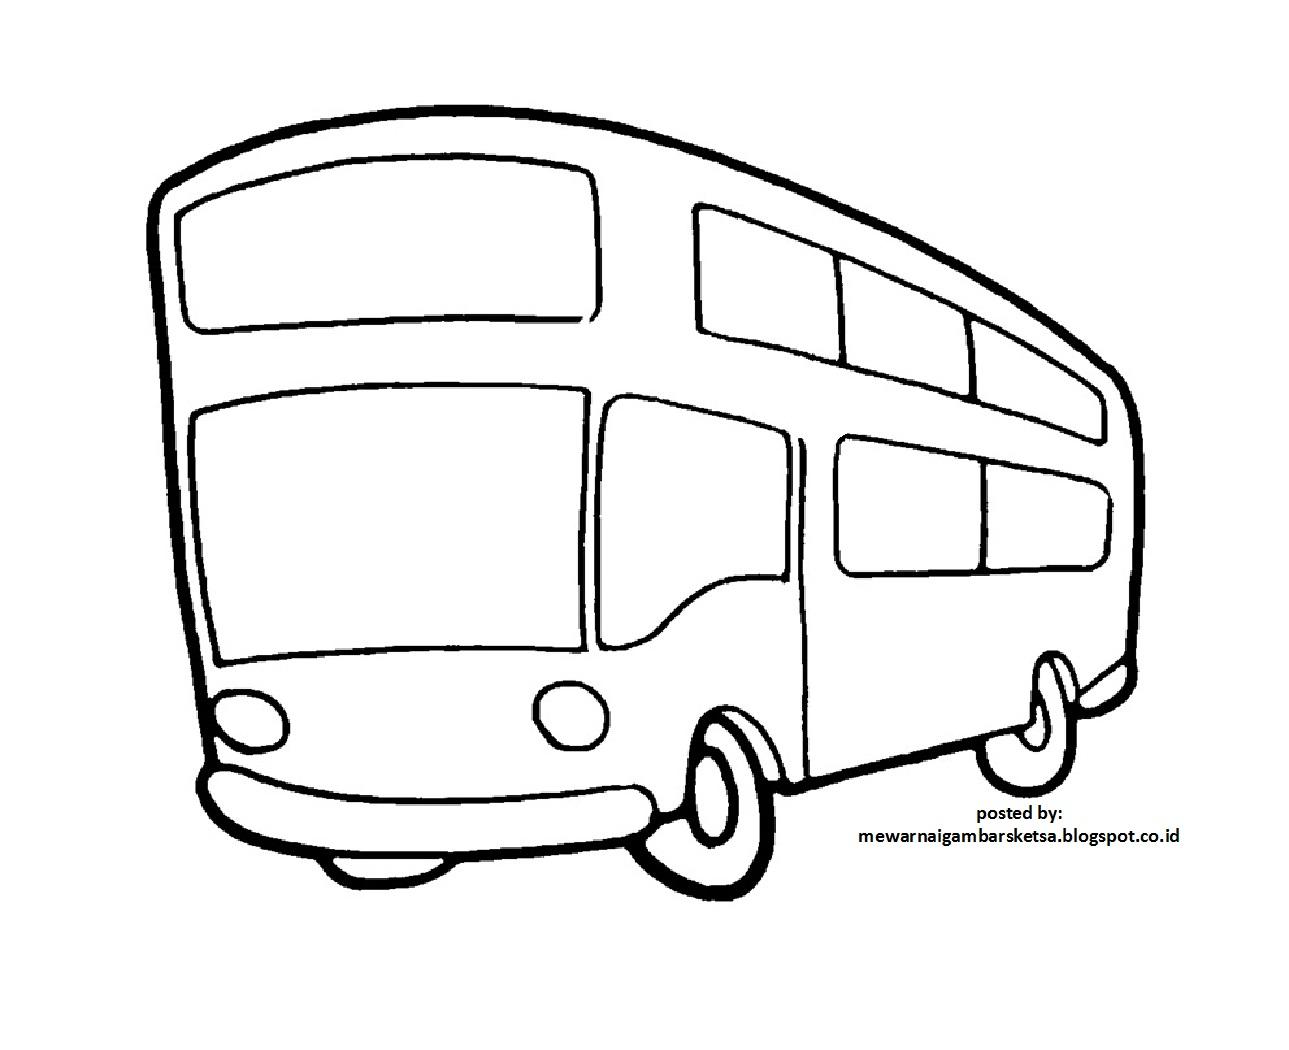 Mewarnai Gambar Mewarnai Gambar Sketsa Bus 1